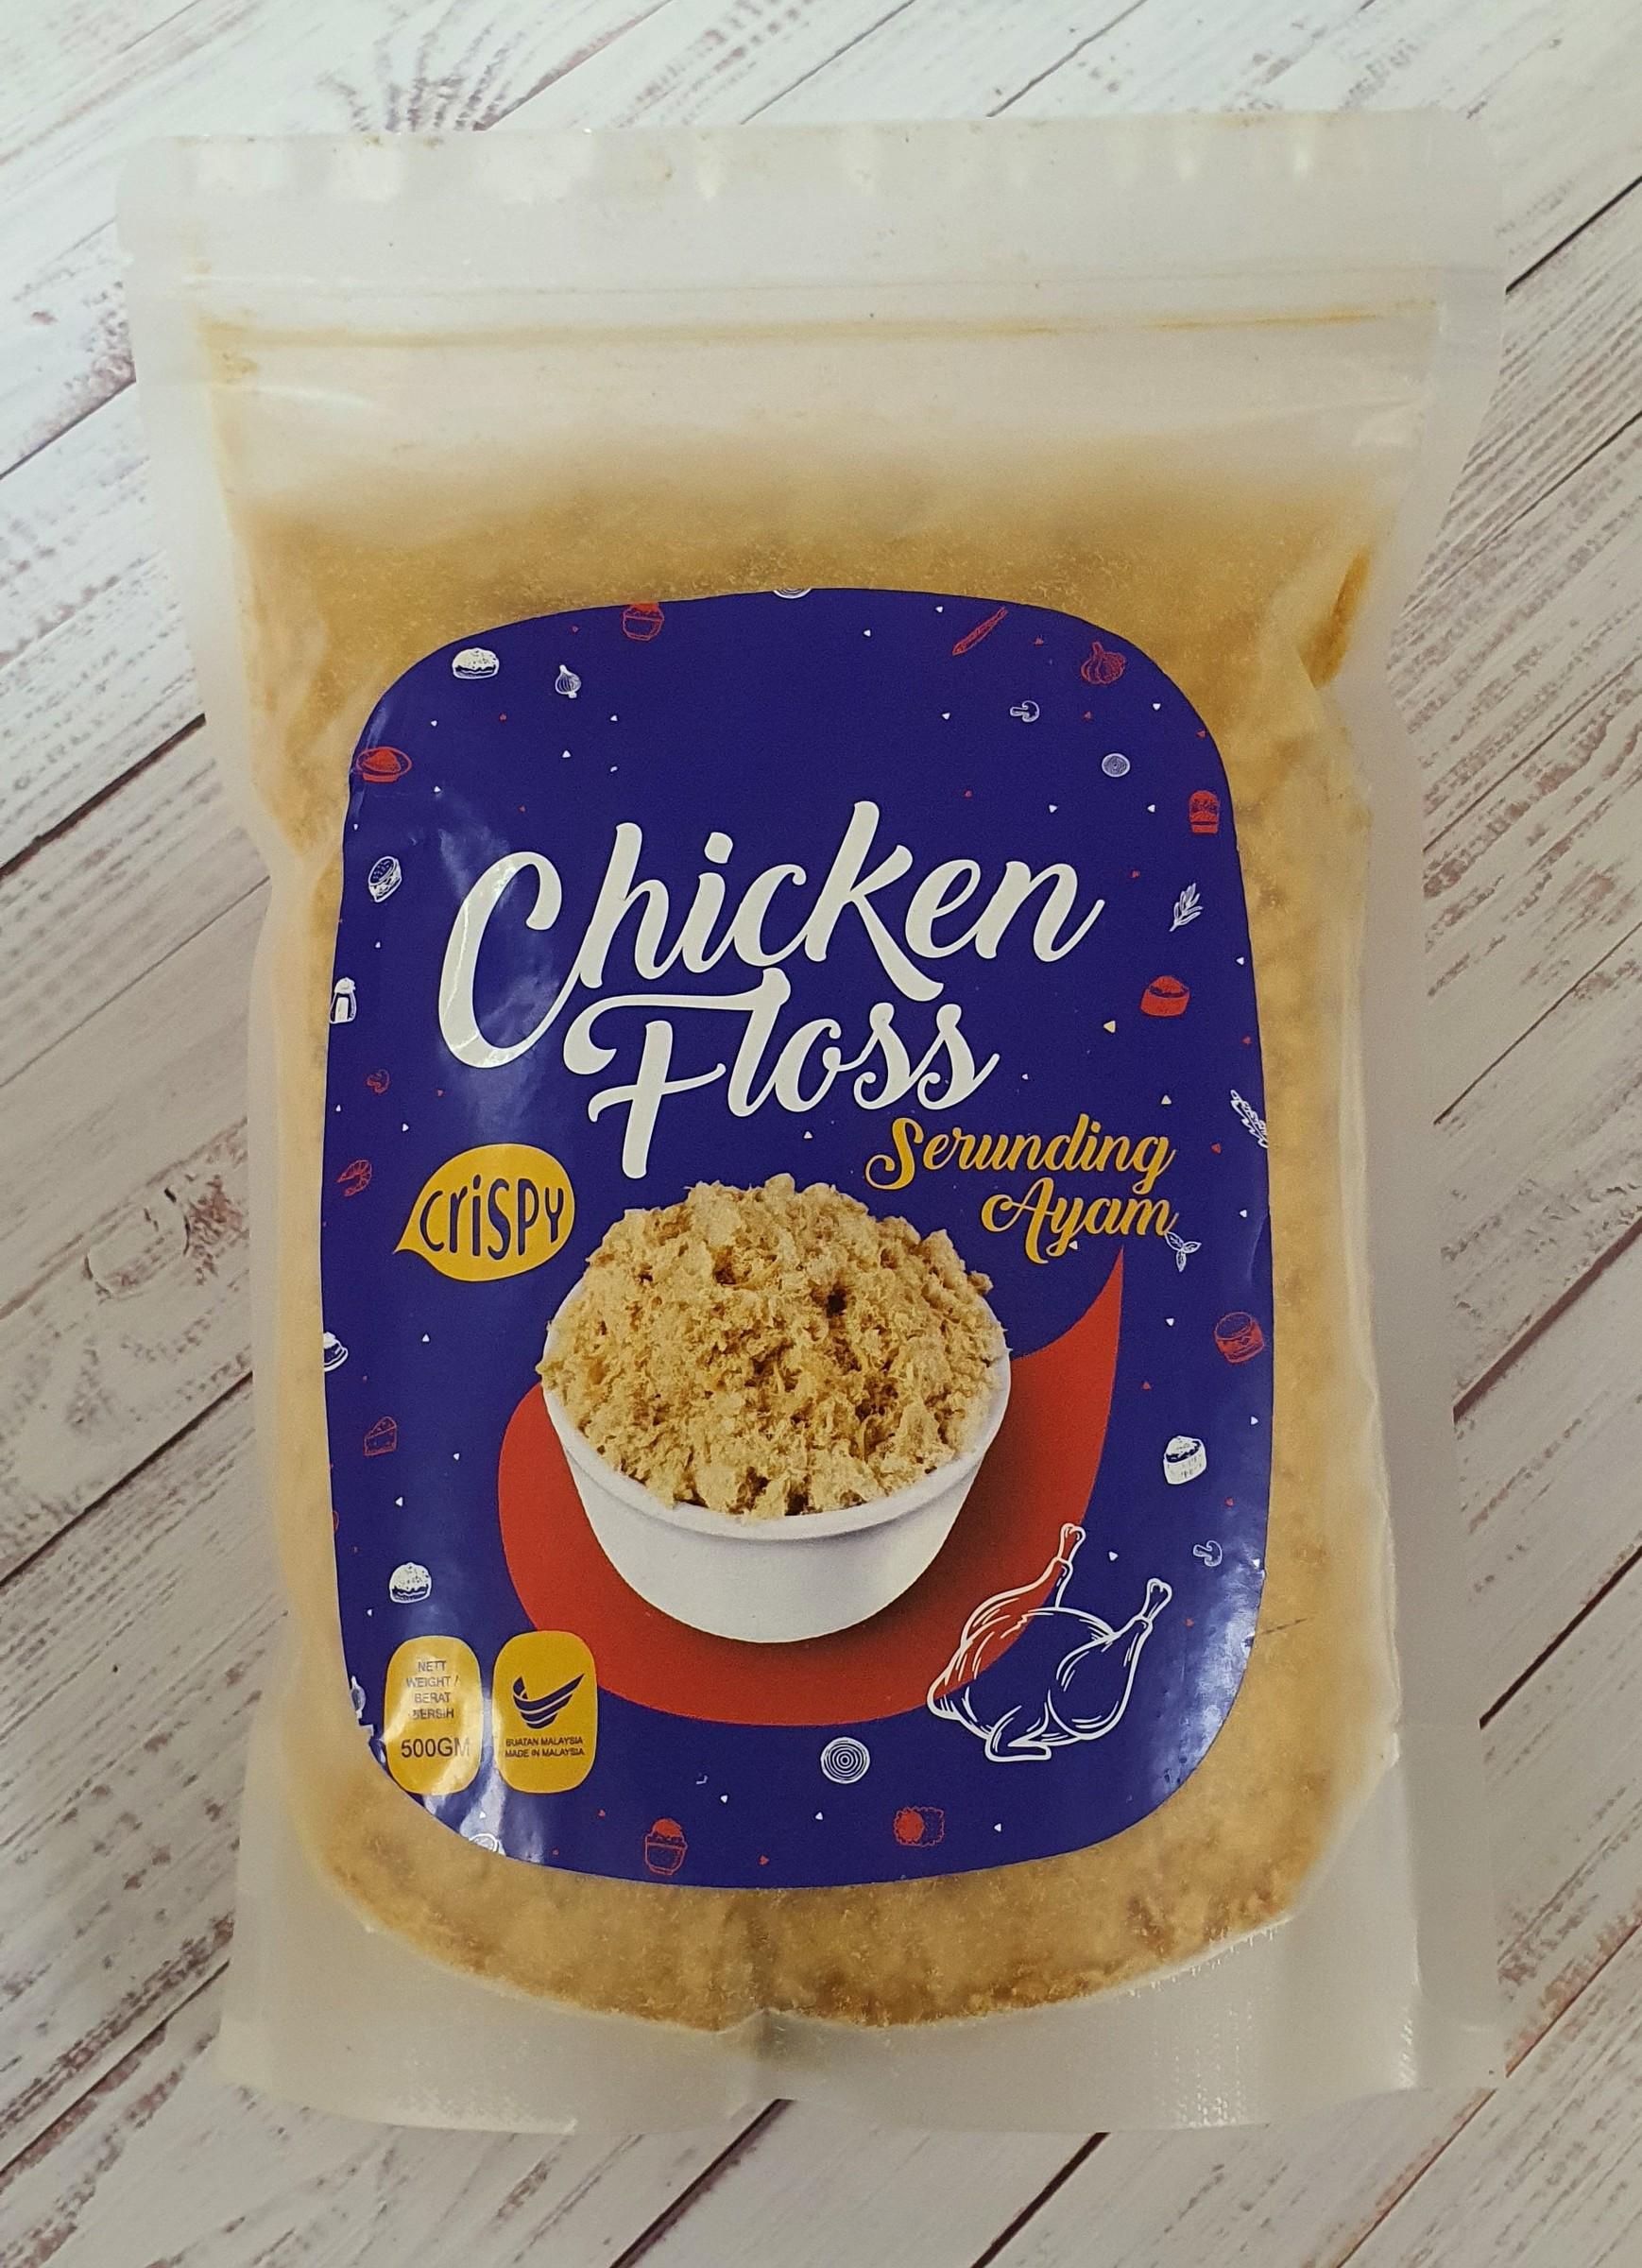 Chicken Floss - Crispy (500gm)